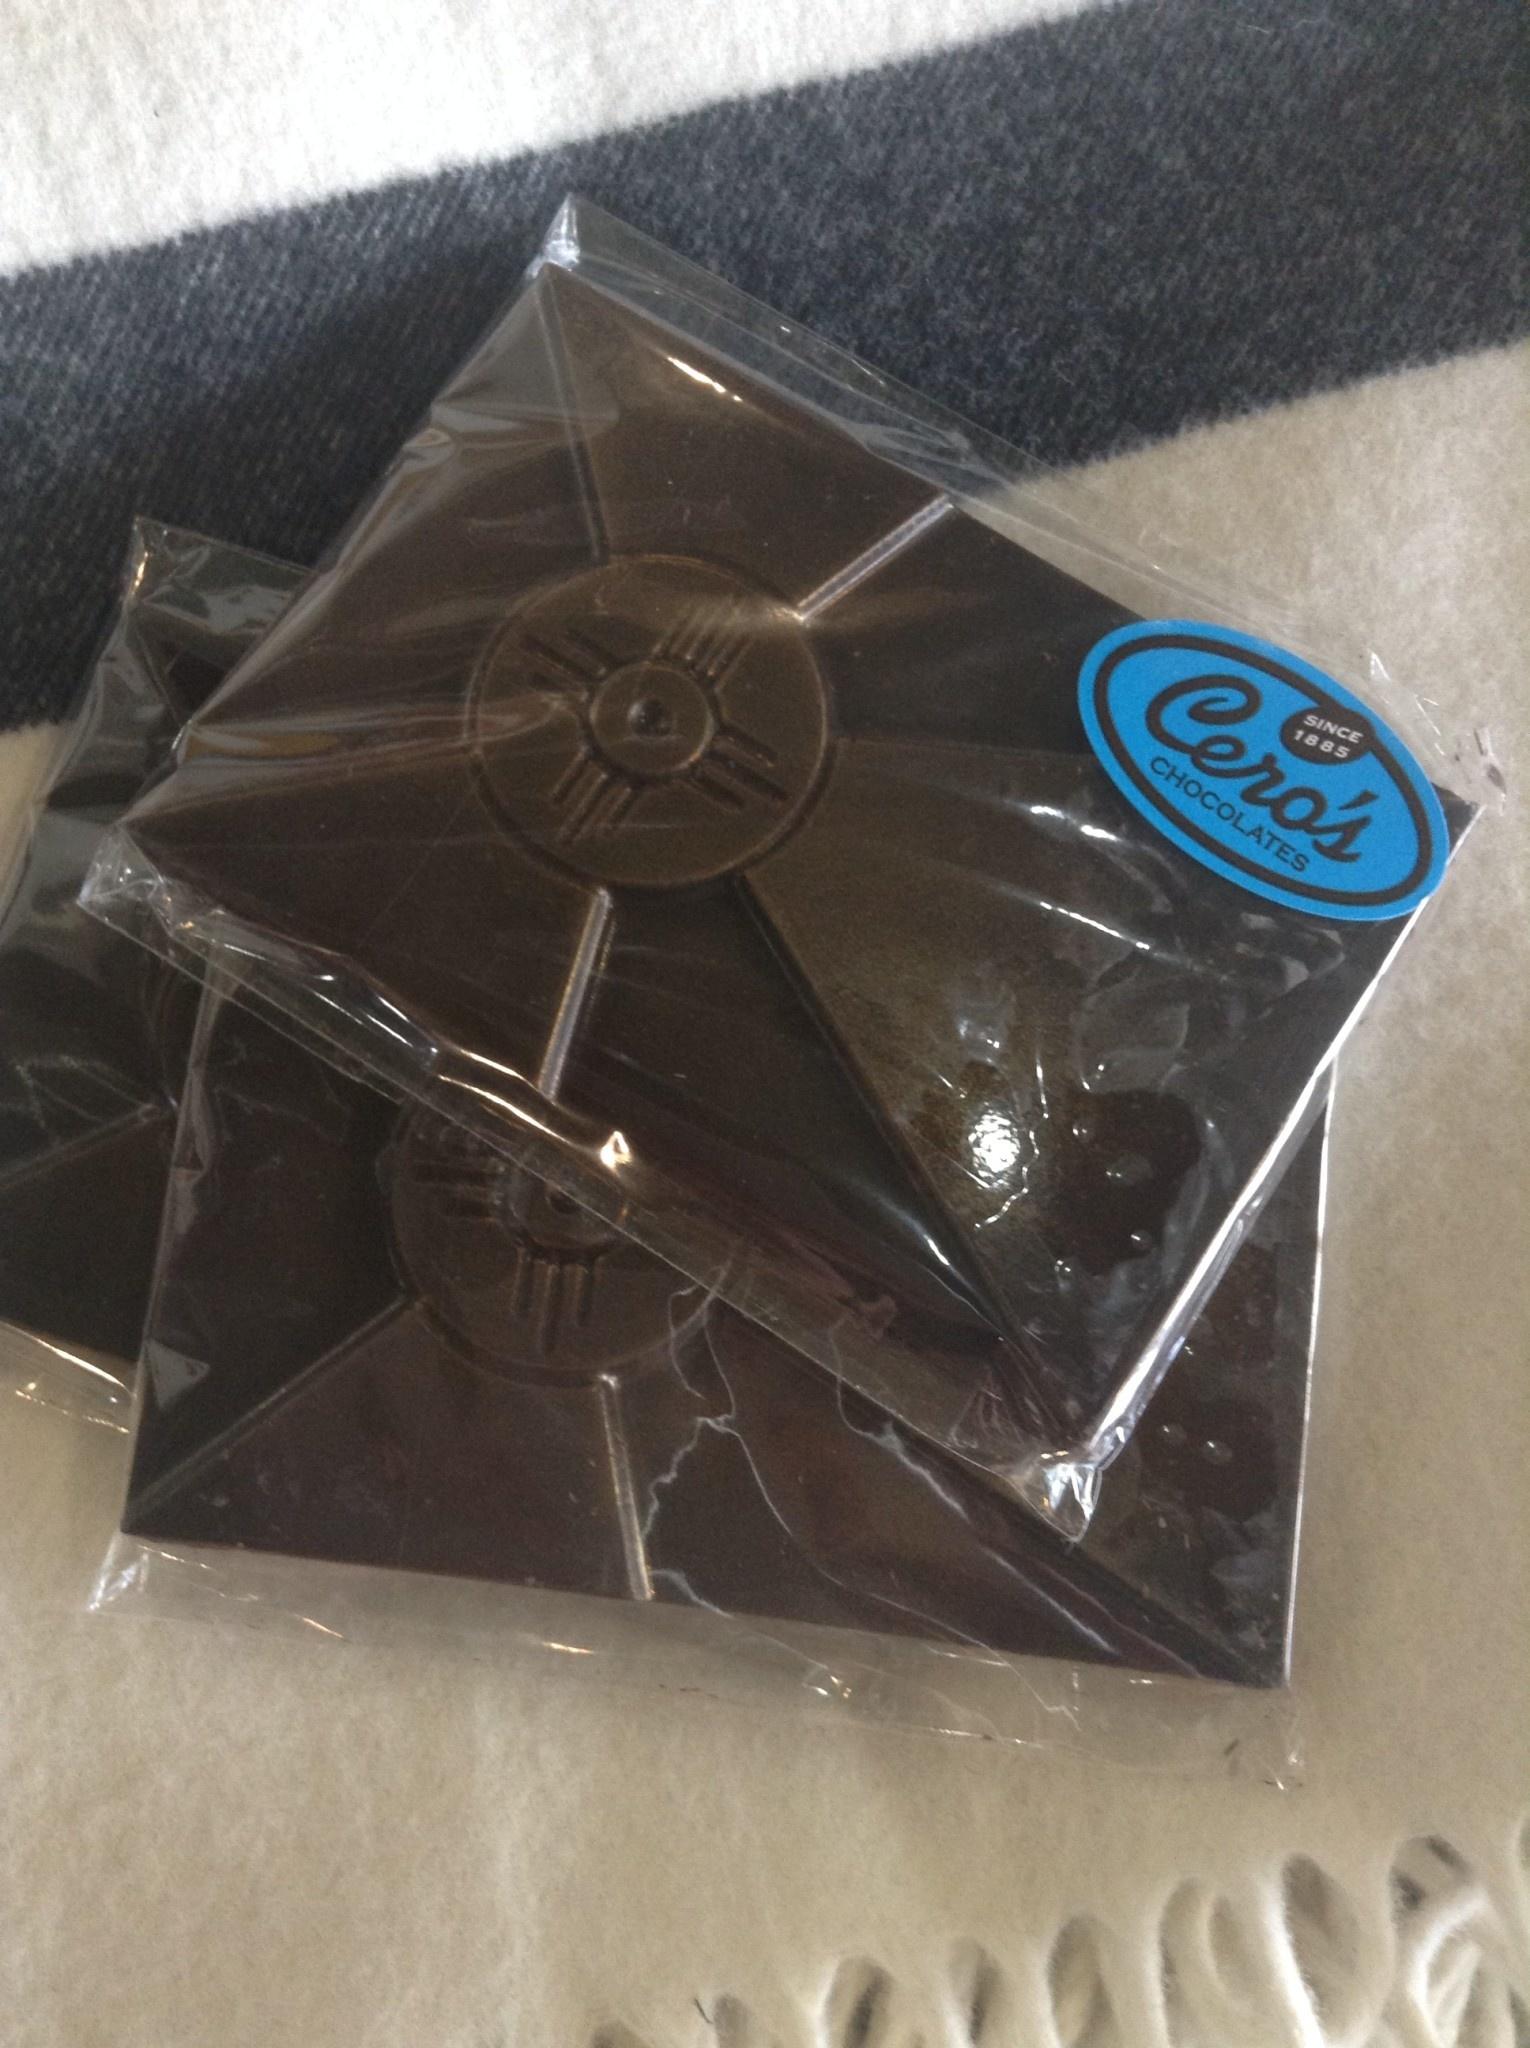 Cero's Candies Dark Chocolate Wichita Flag